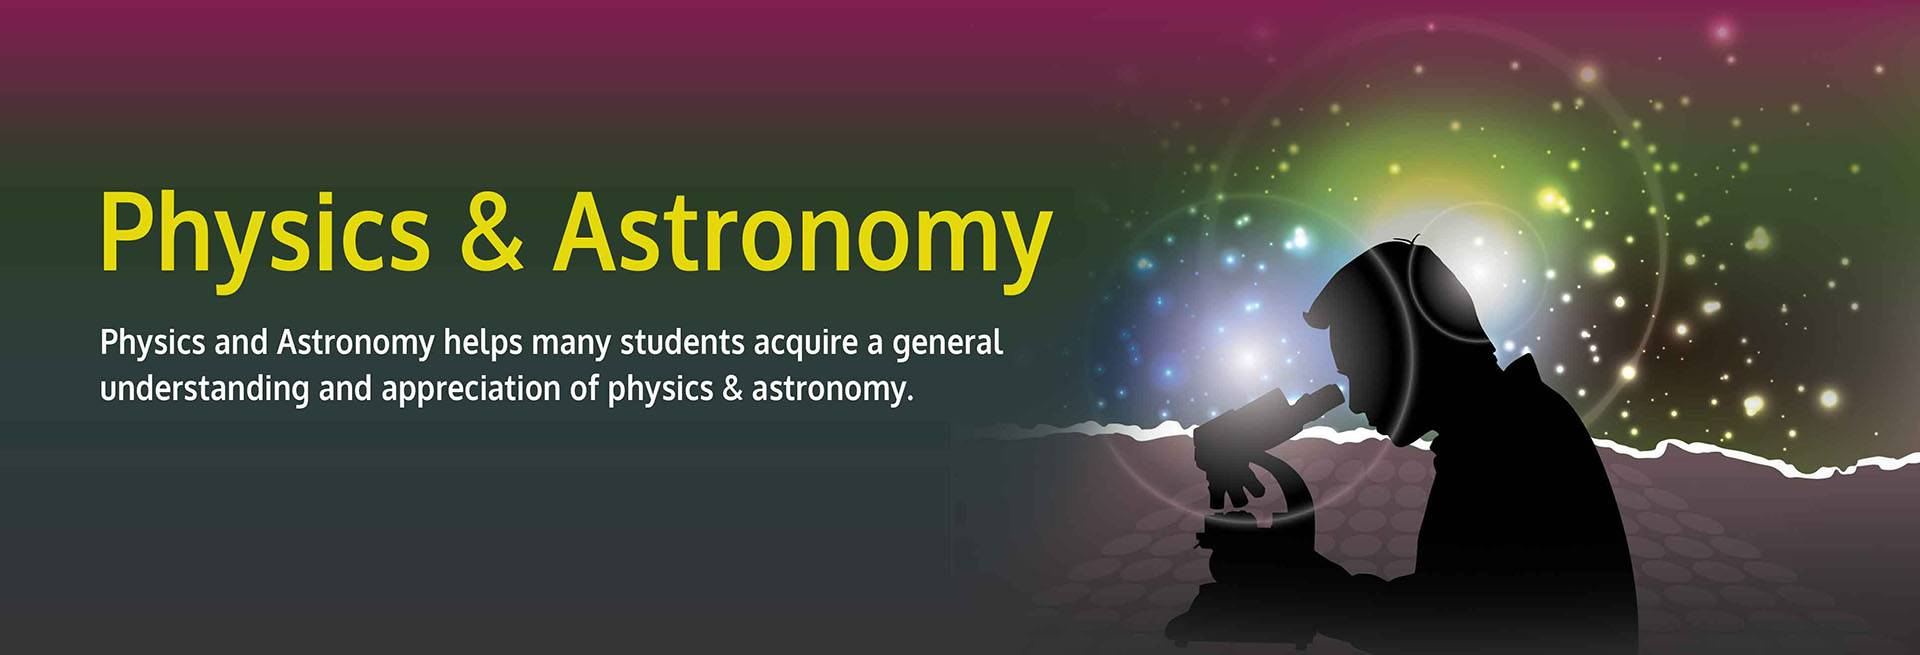 Physics & Astronomy